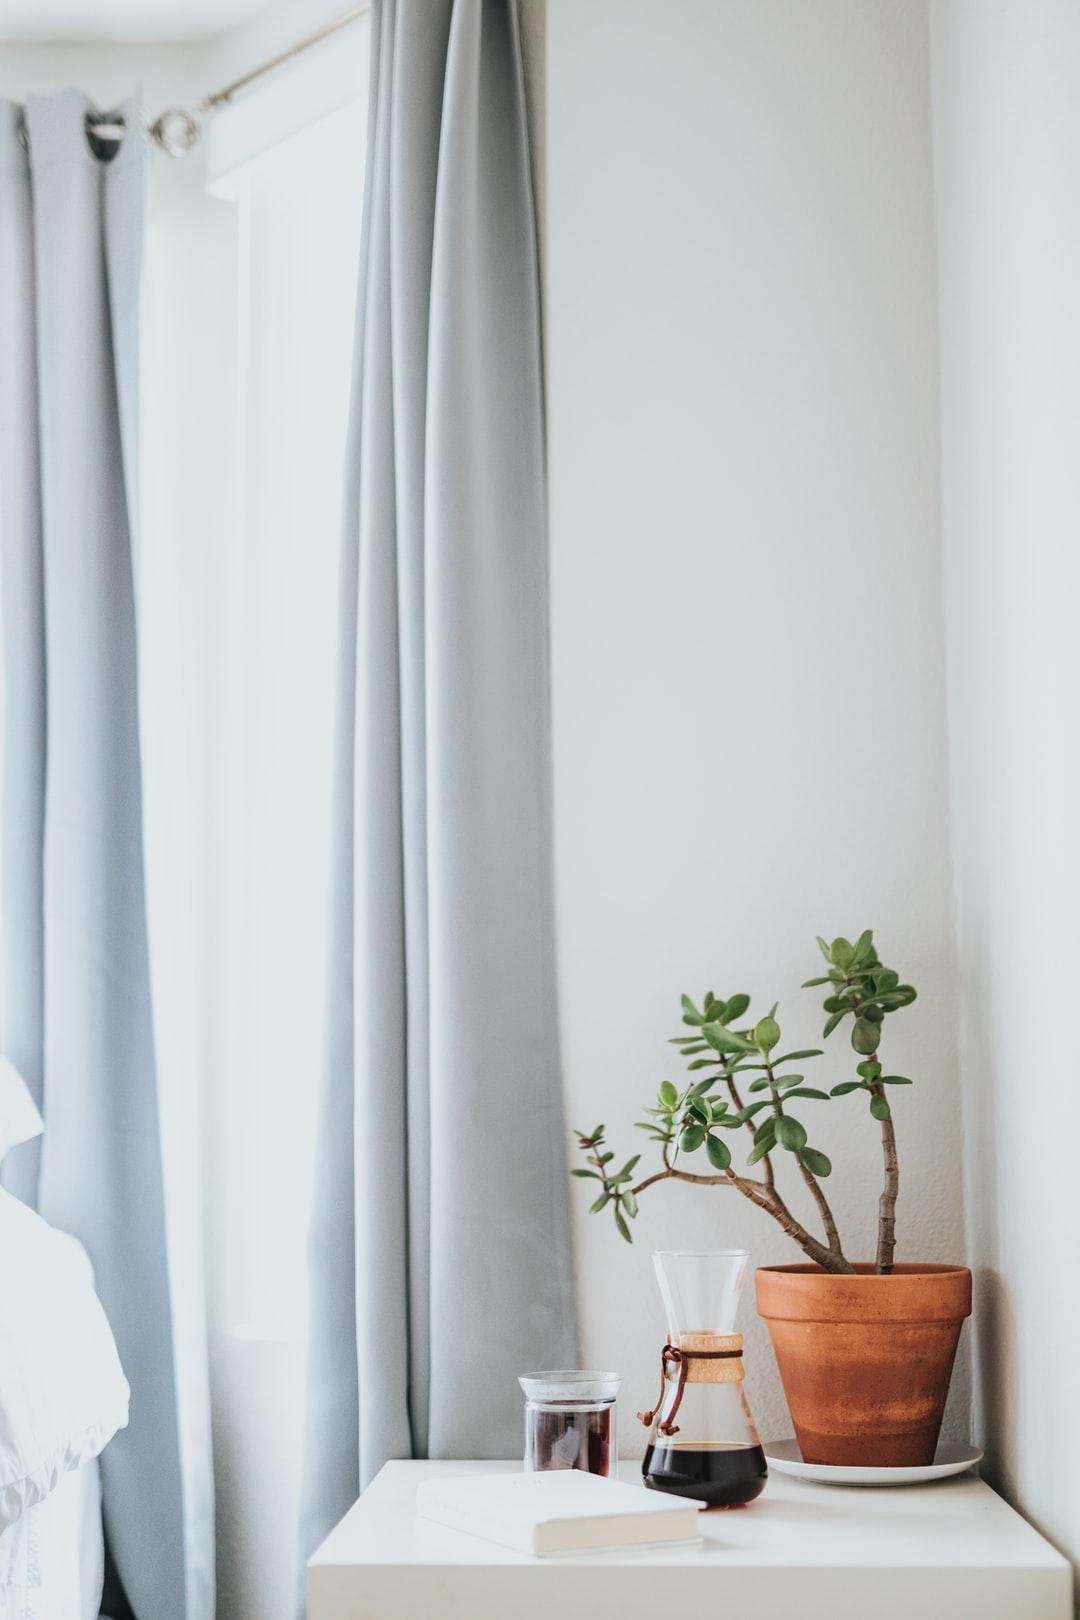 Large white curtain design